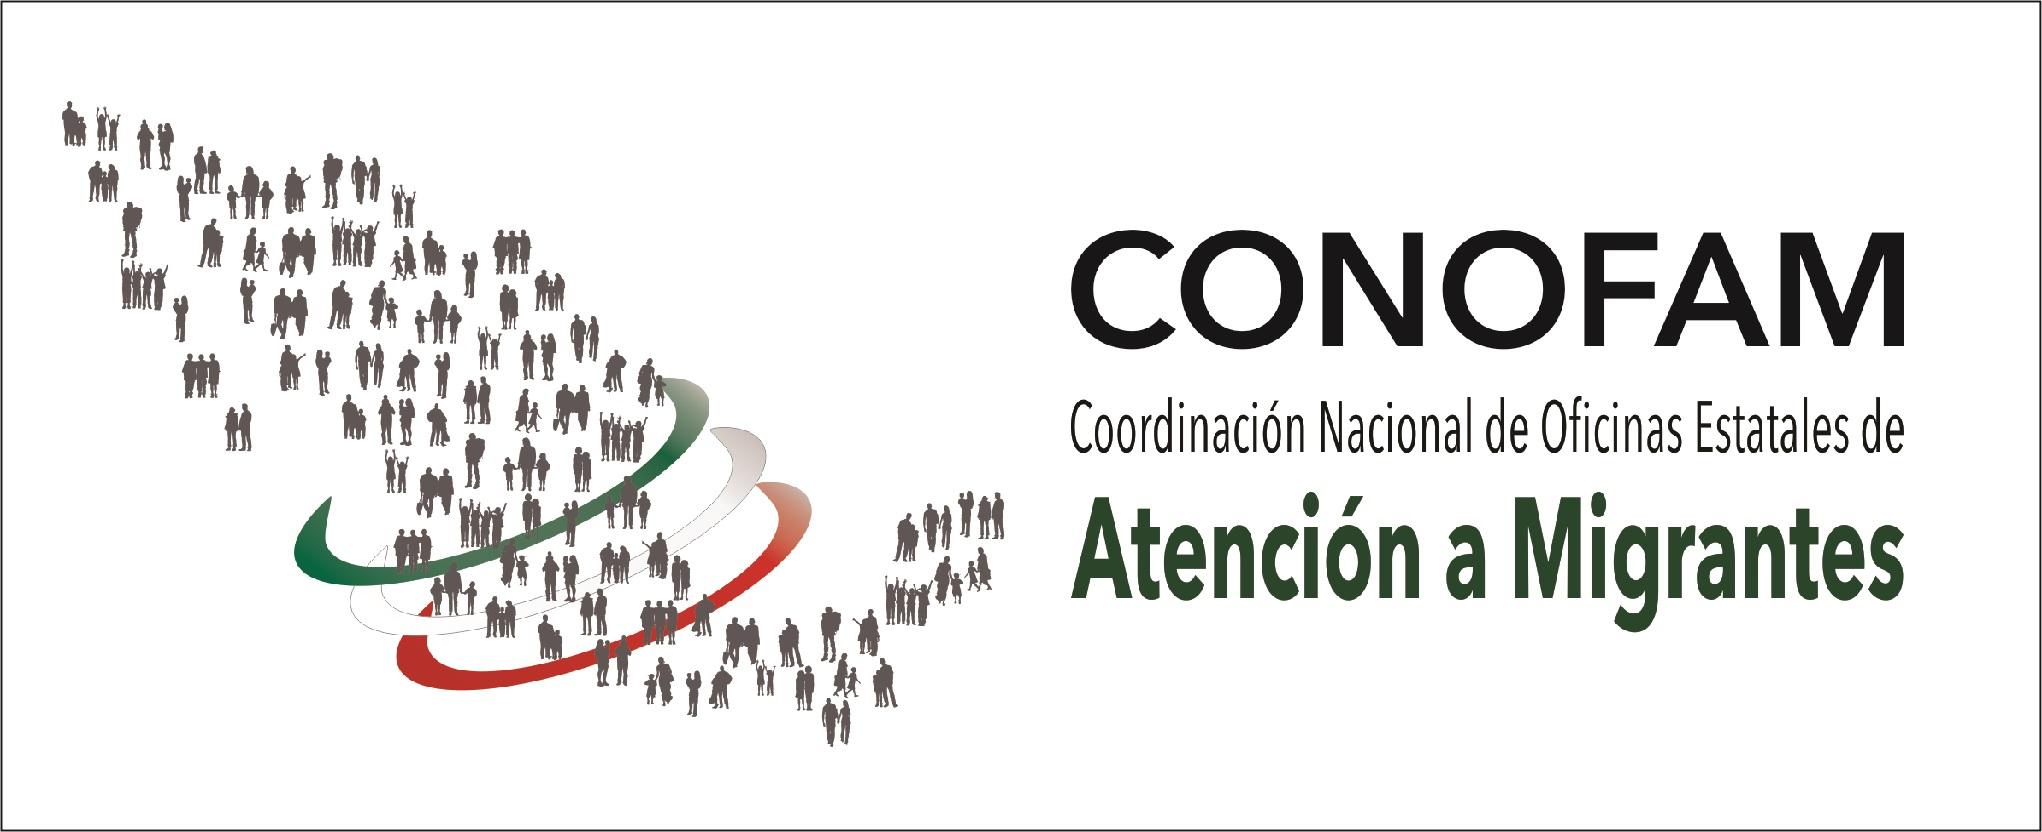 http://www.conofamac.org.mx/inicio/